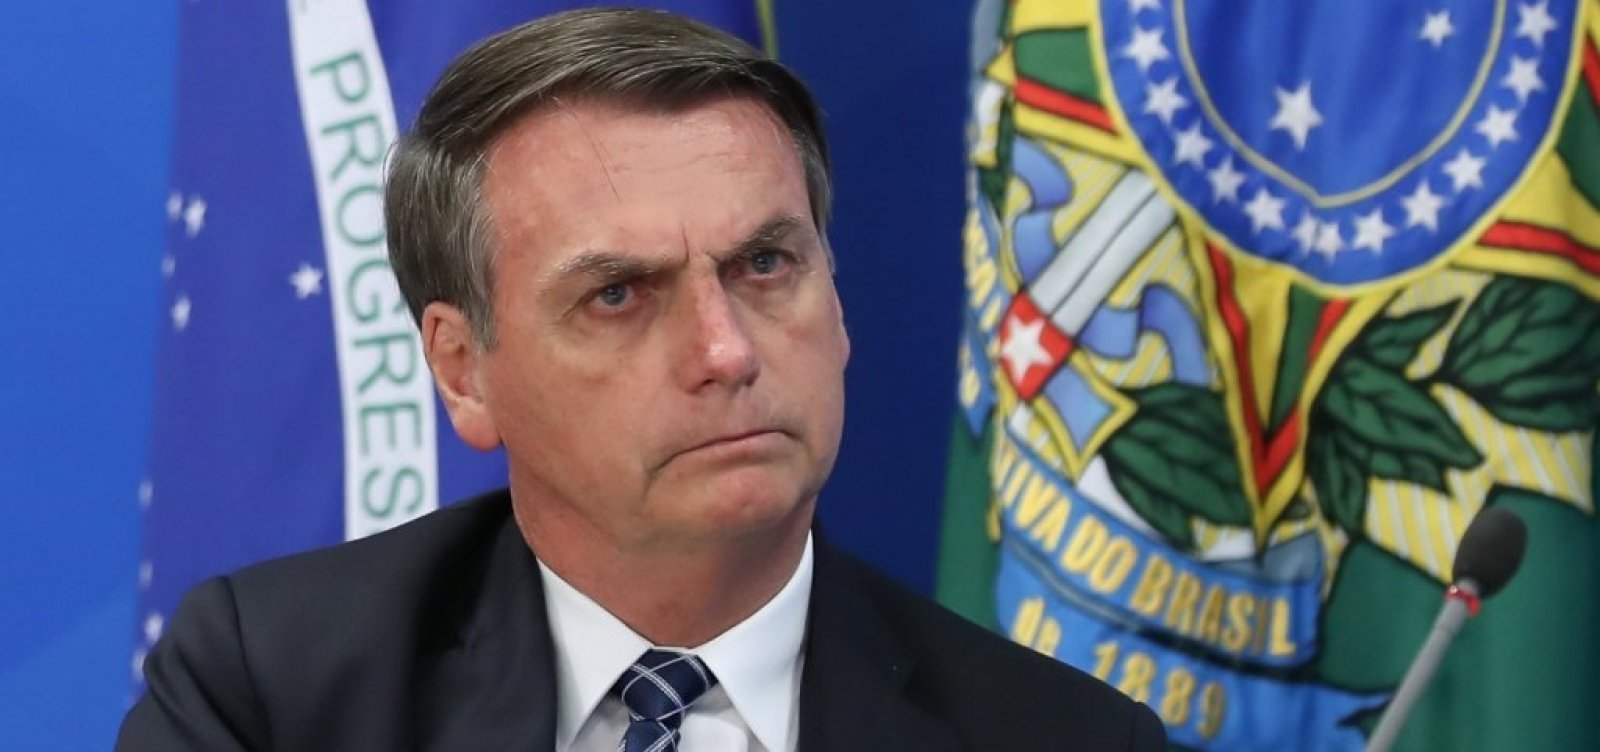 Grupo de médicos e cientistas protocola pedido de impeachment contra Bolsonaro